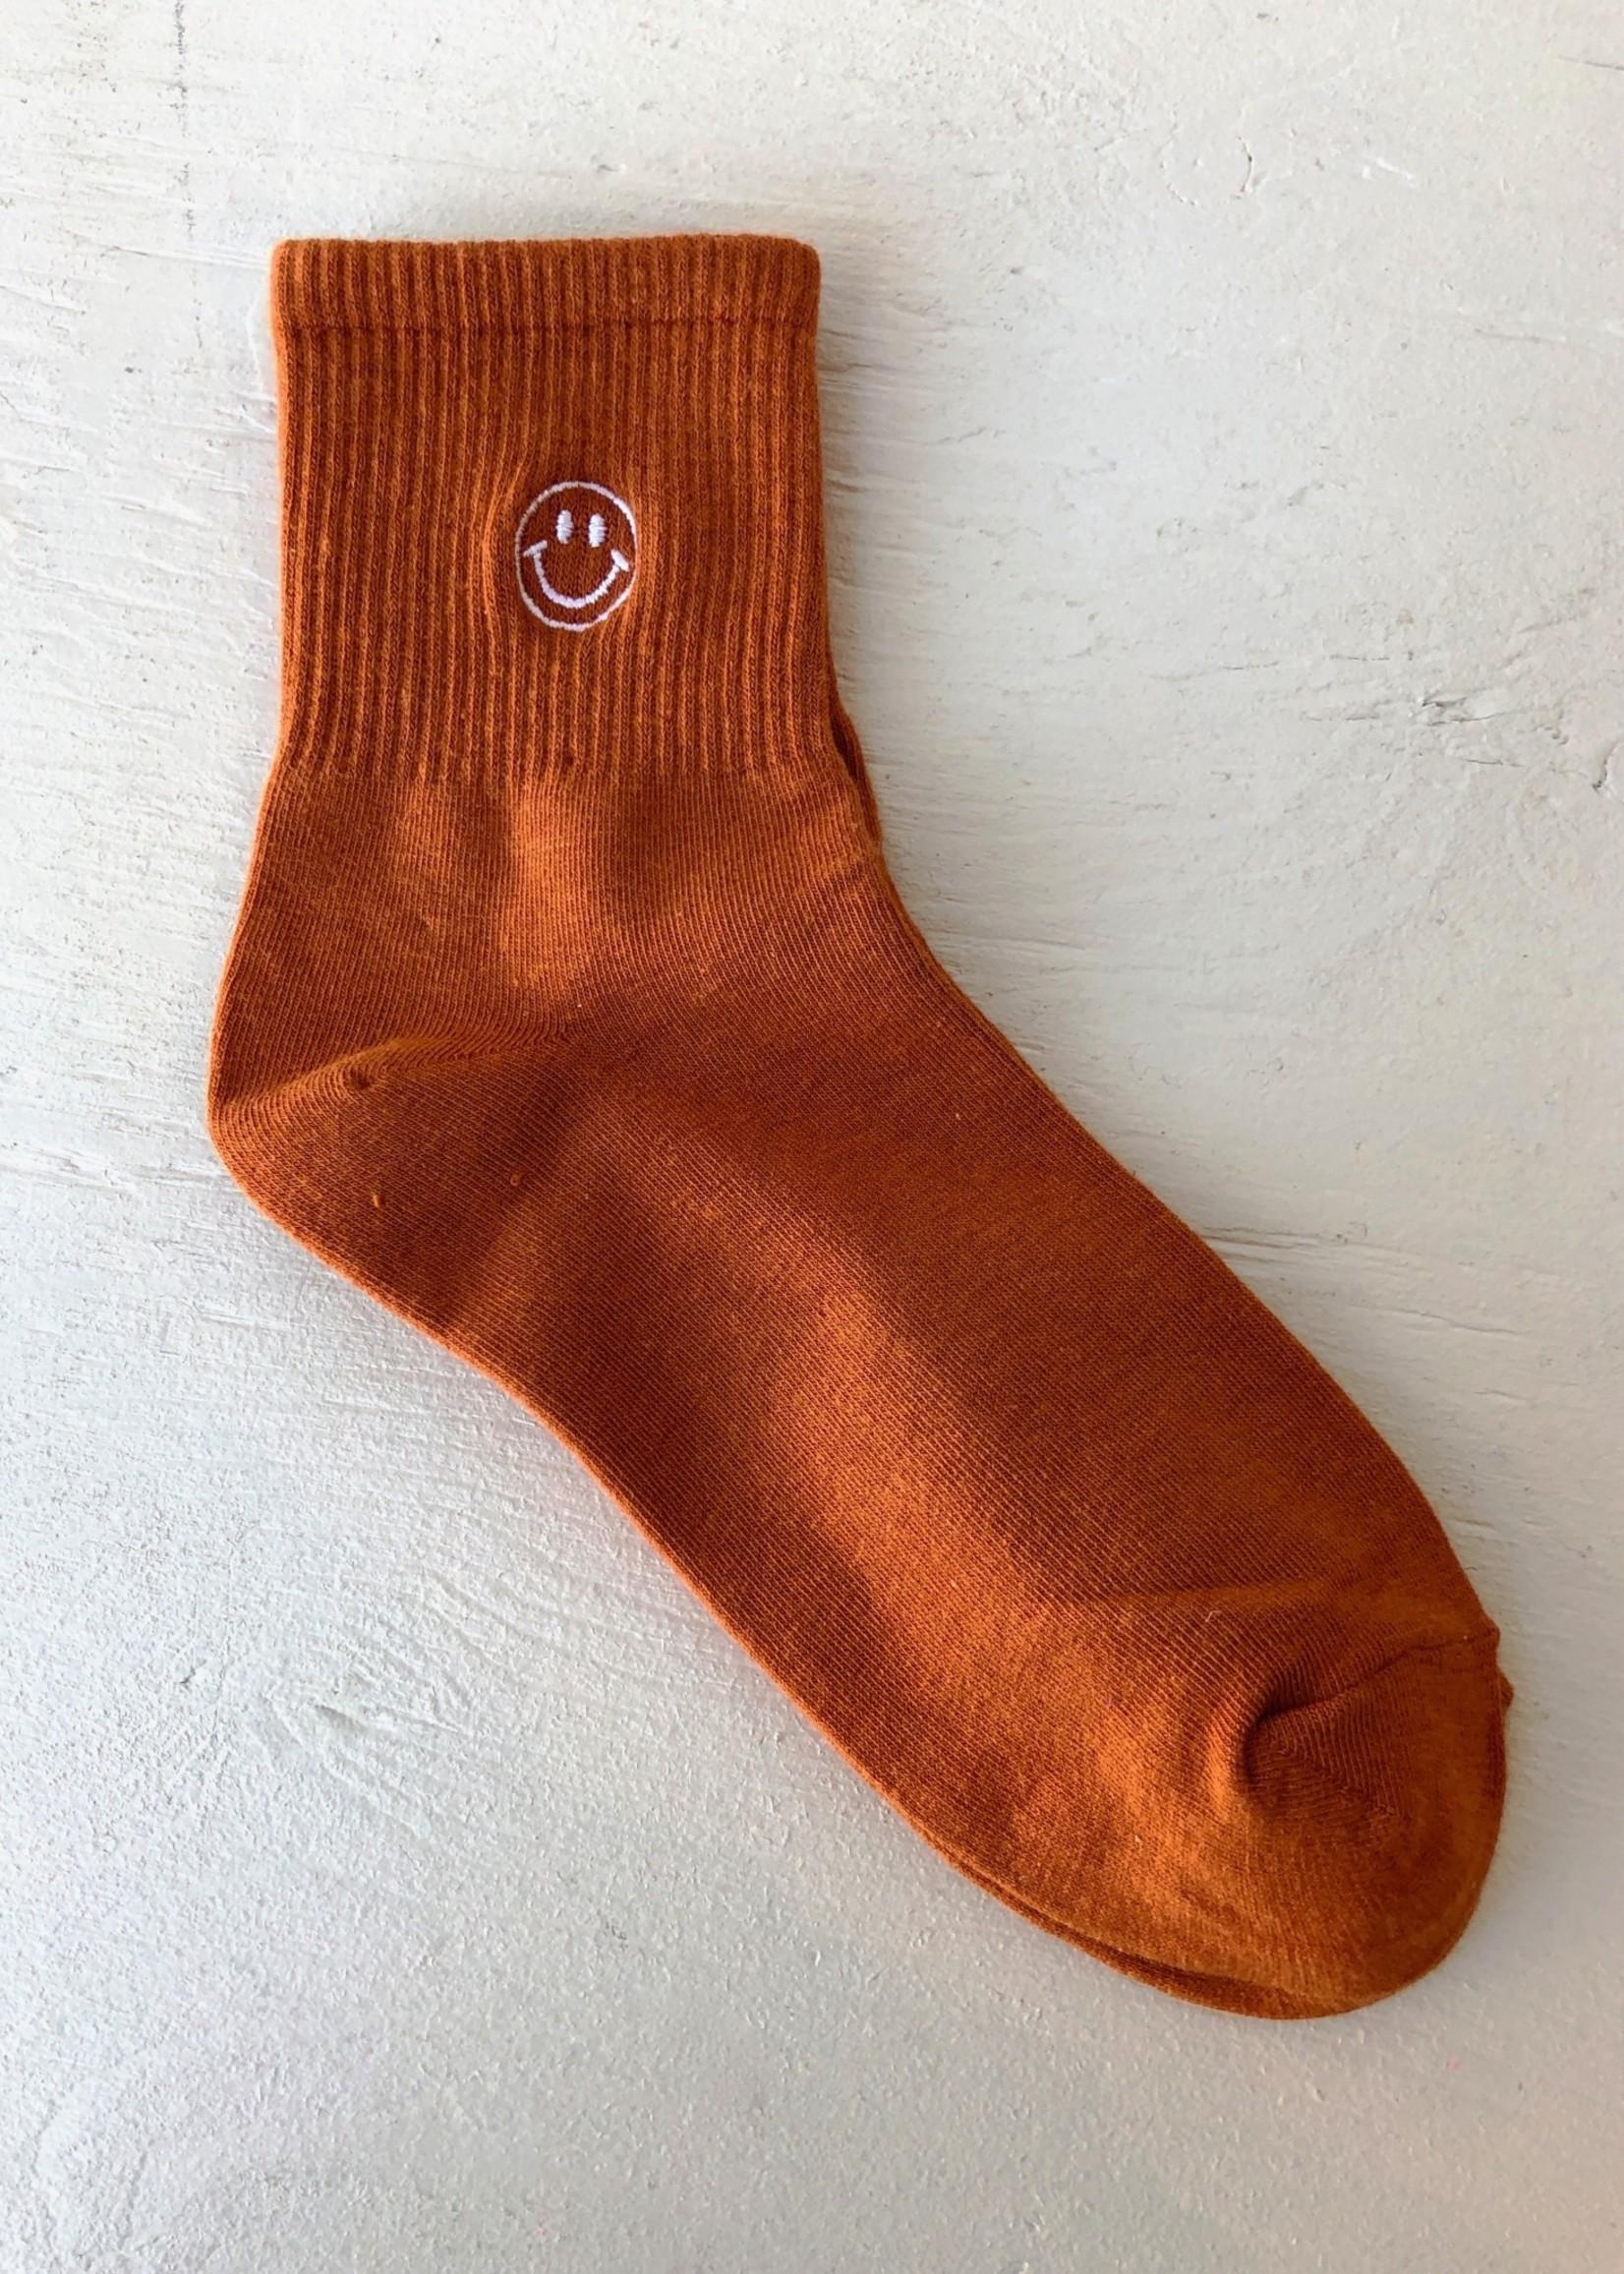 Empire Exchange Smiley Socks by Empire Exchange